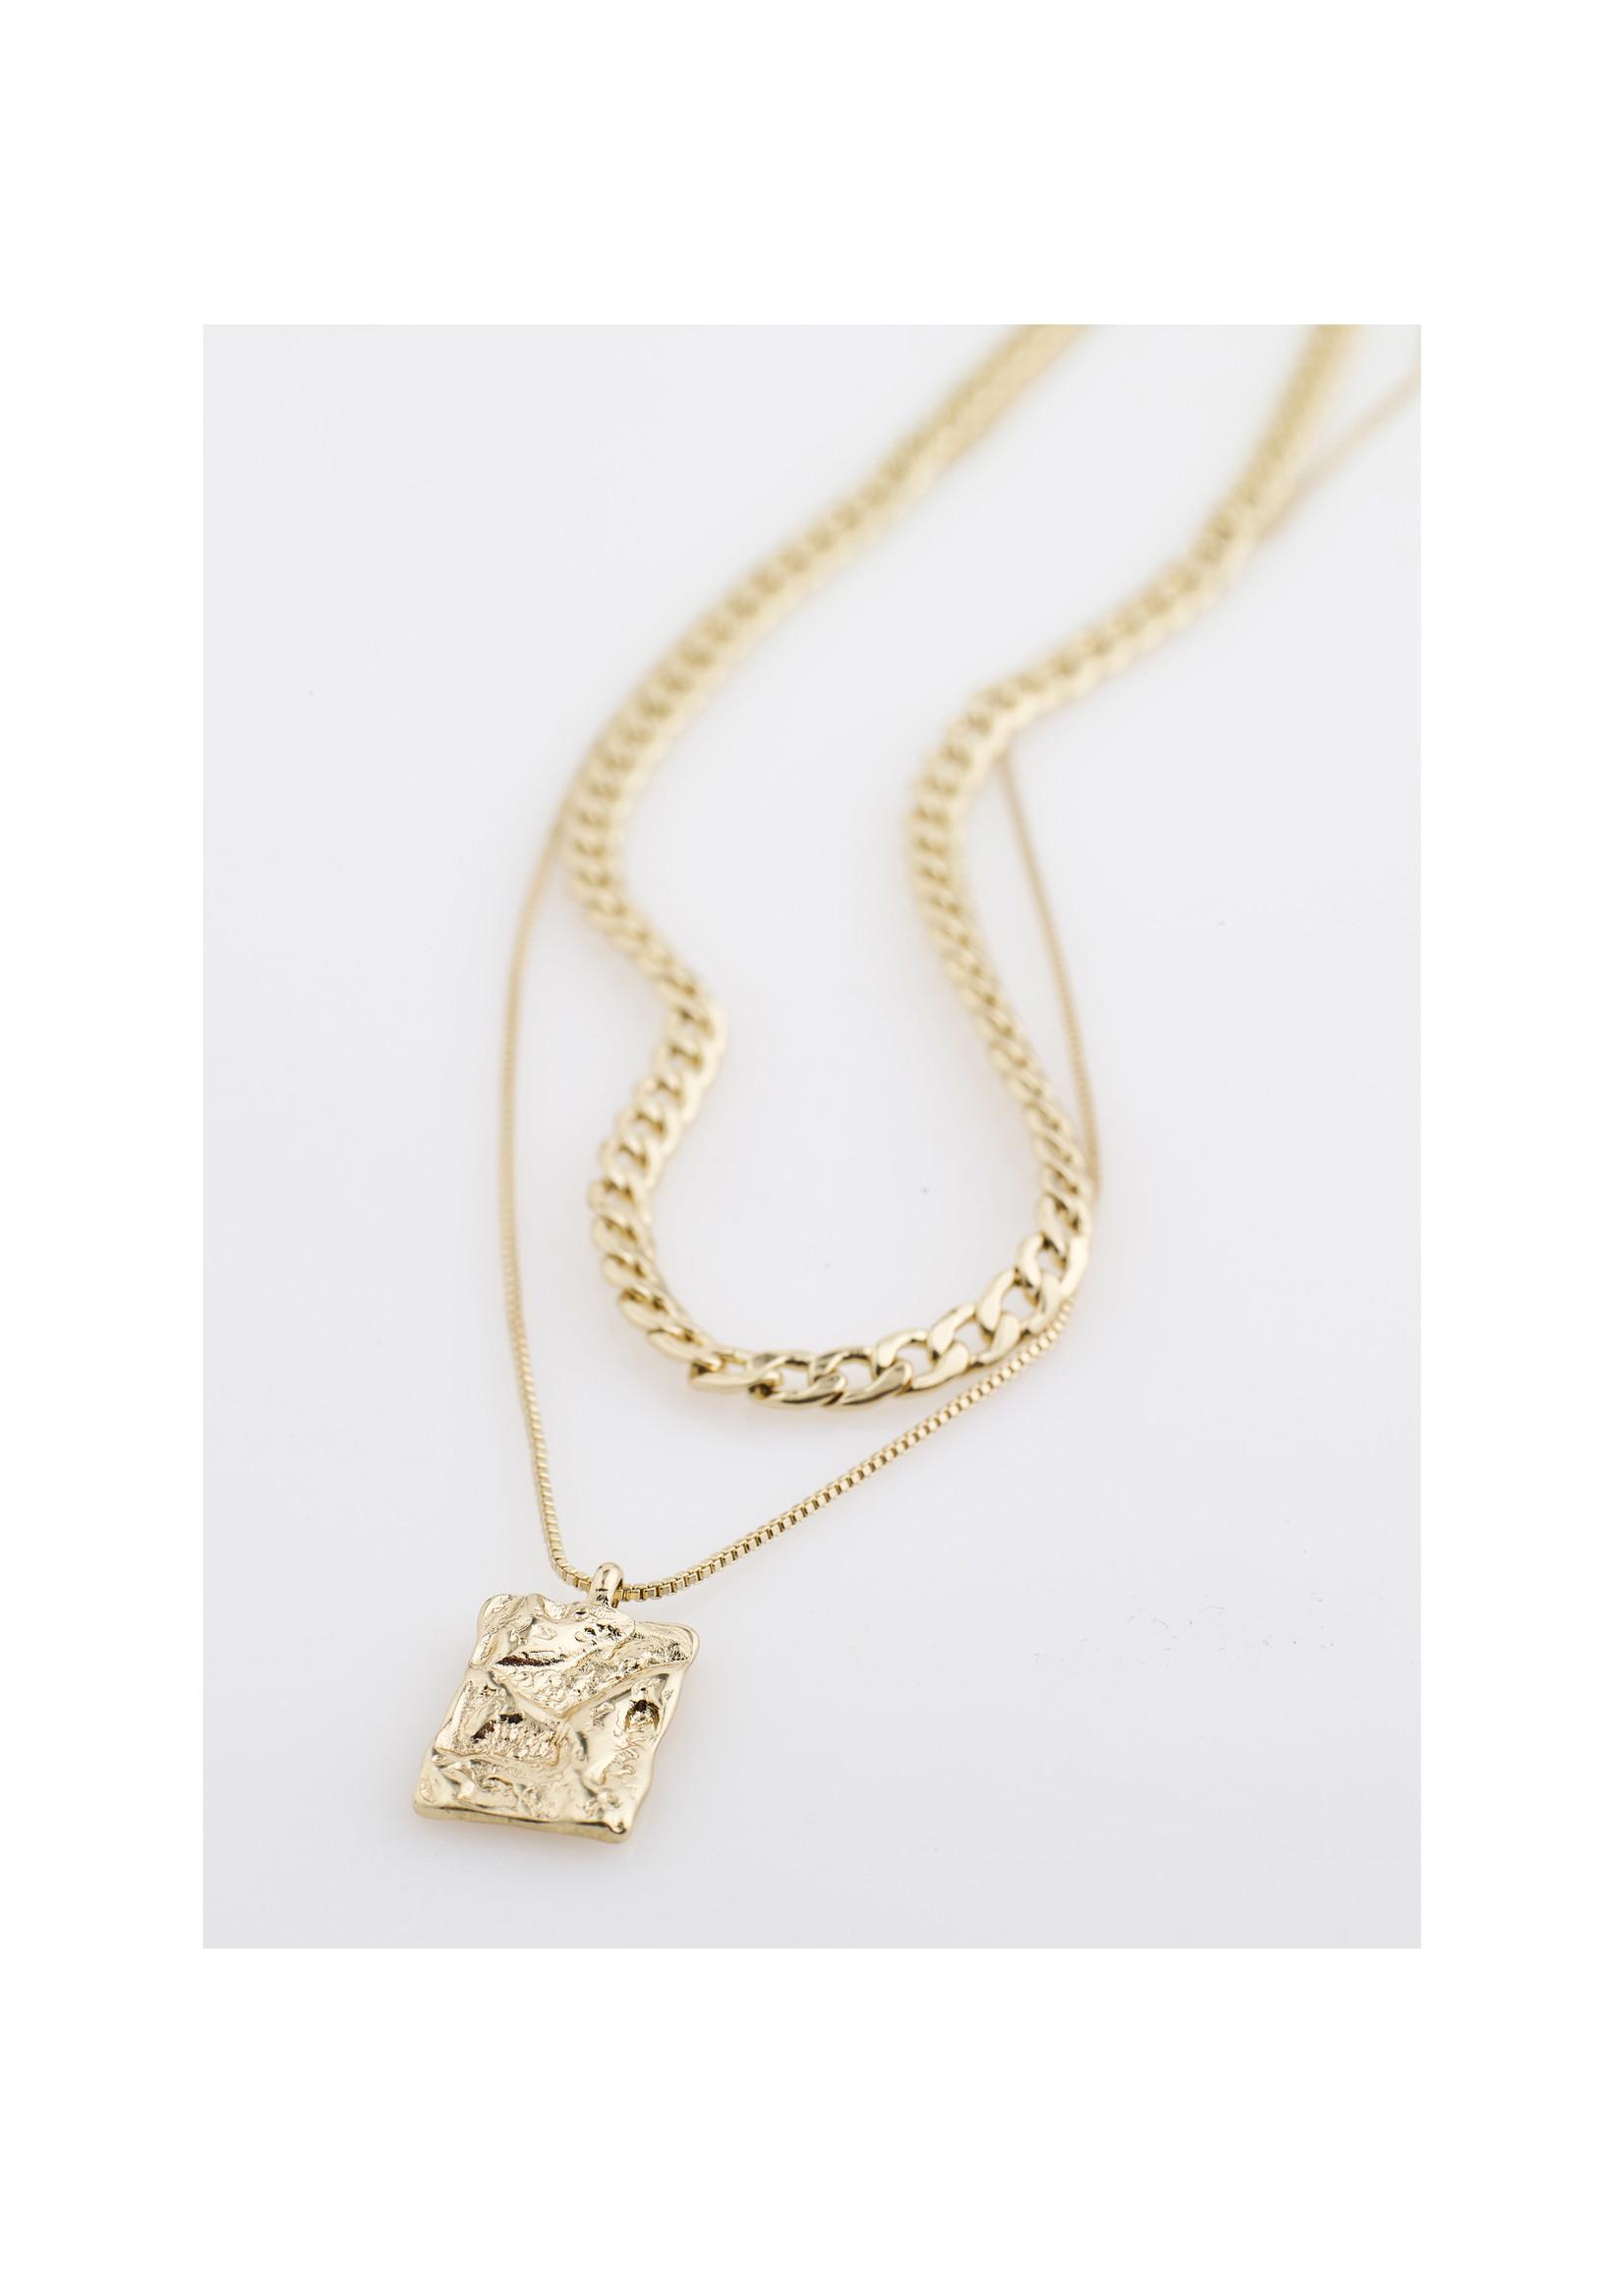 Pilgrim Jewellery Bathilda 2-in-1 Necklace - Gold